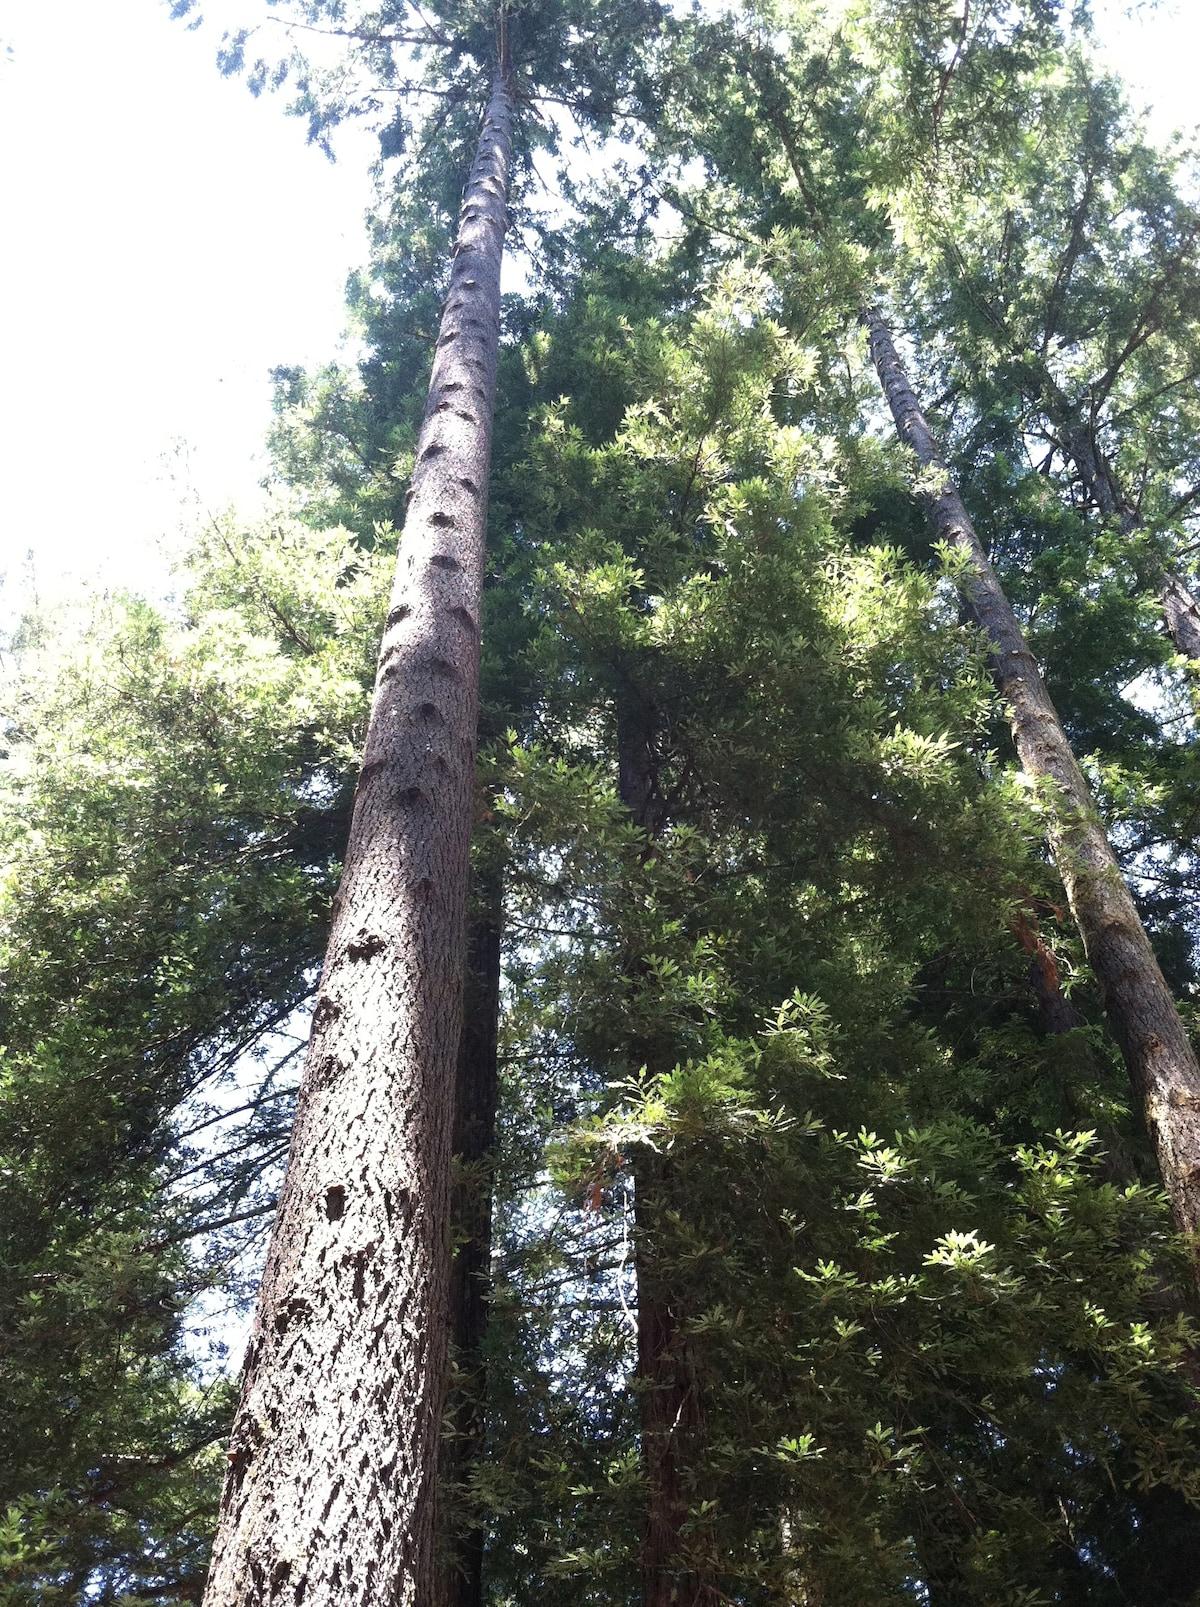 120' of Redwood (that's my tree!)